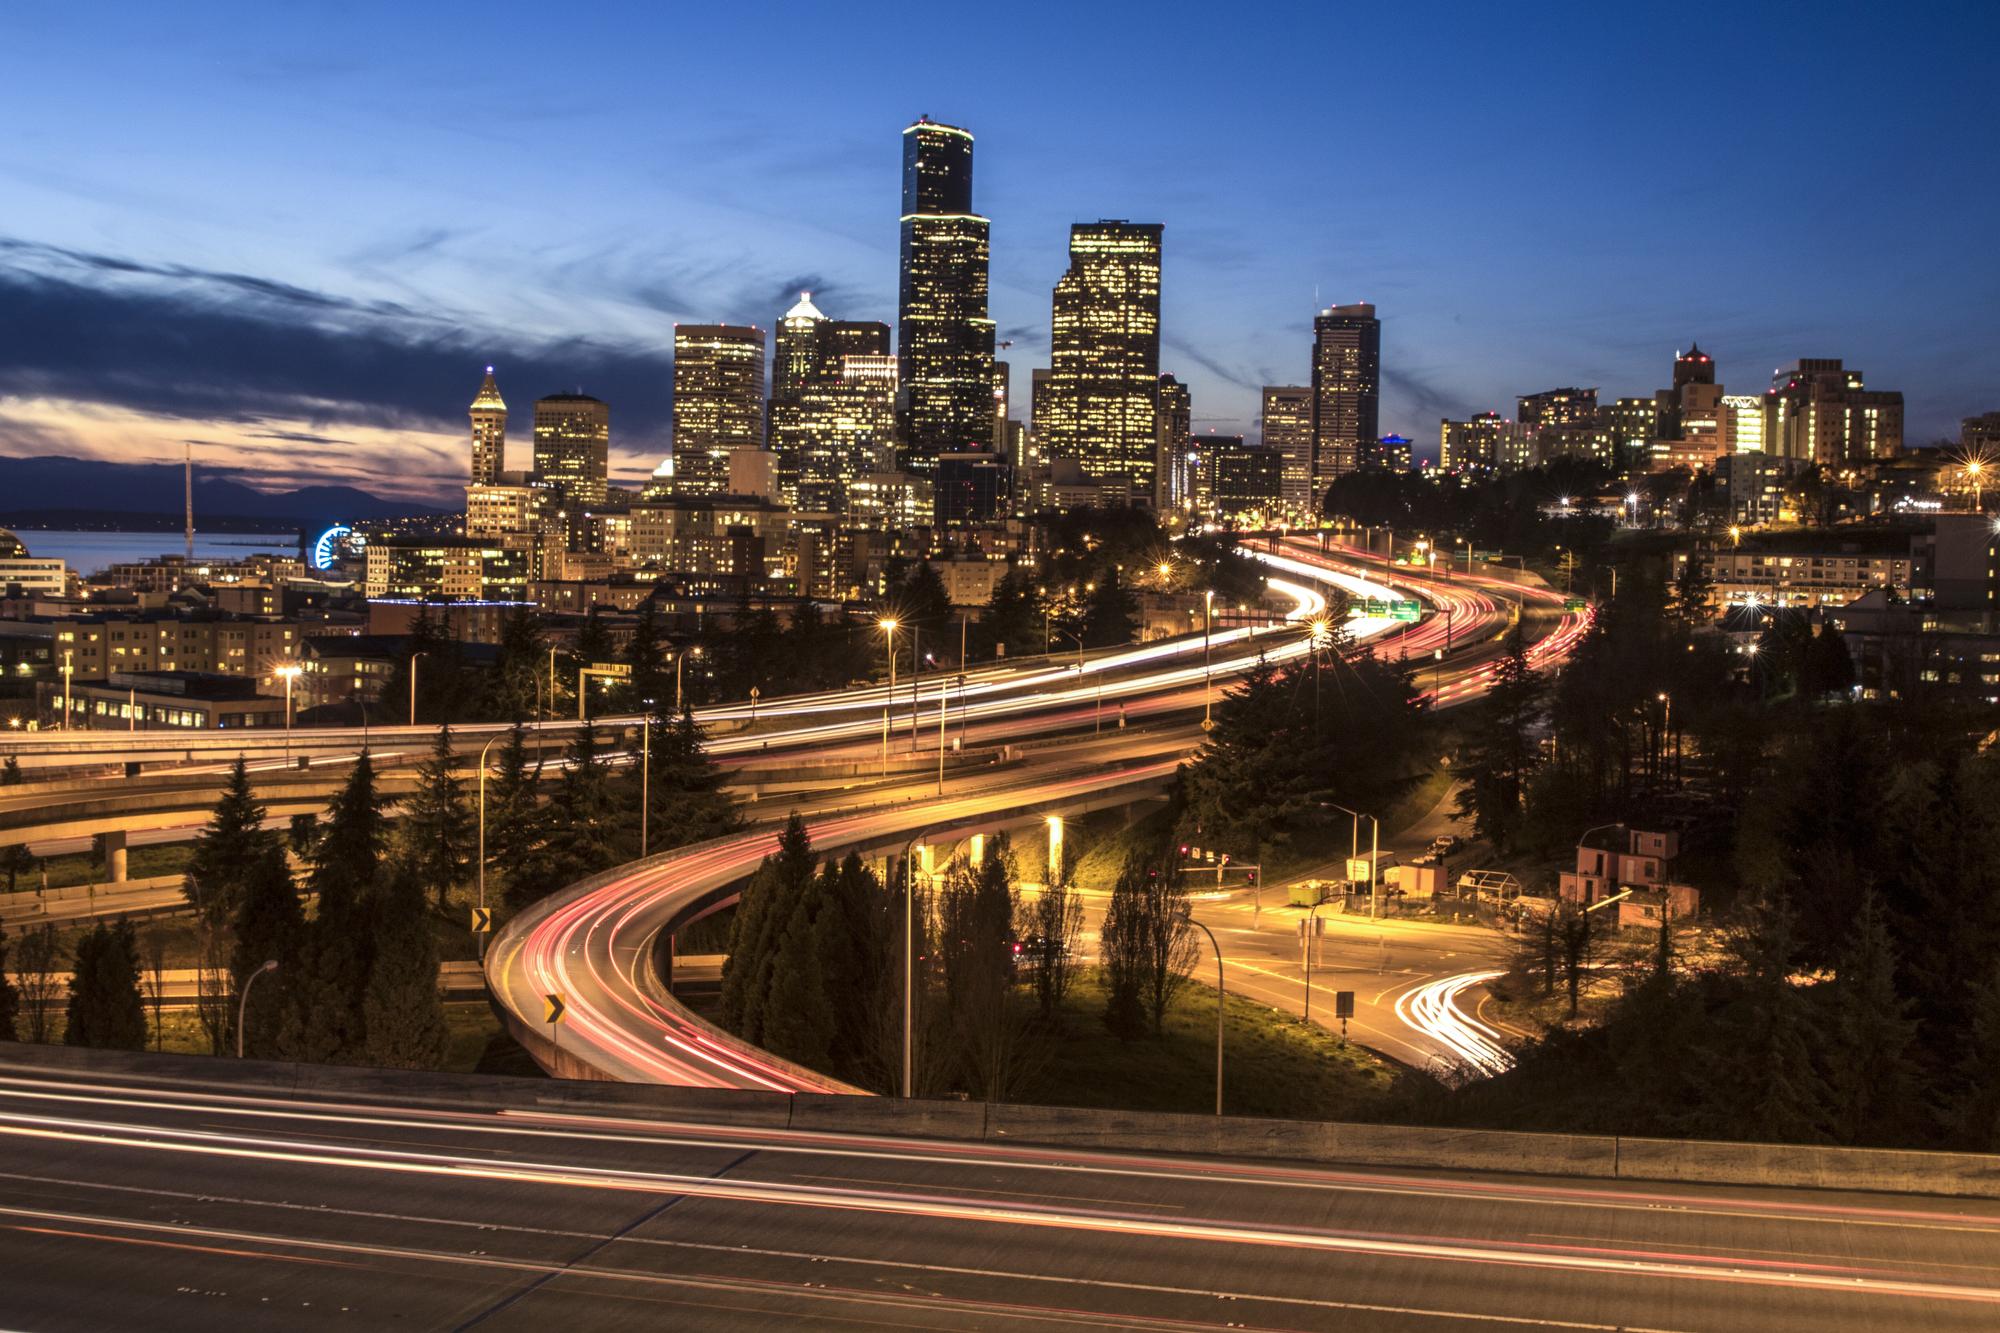 500px Photo ID: 153514225 - Seattle city lights on full display.